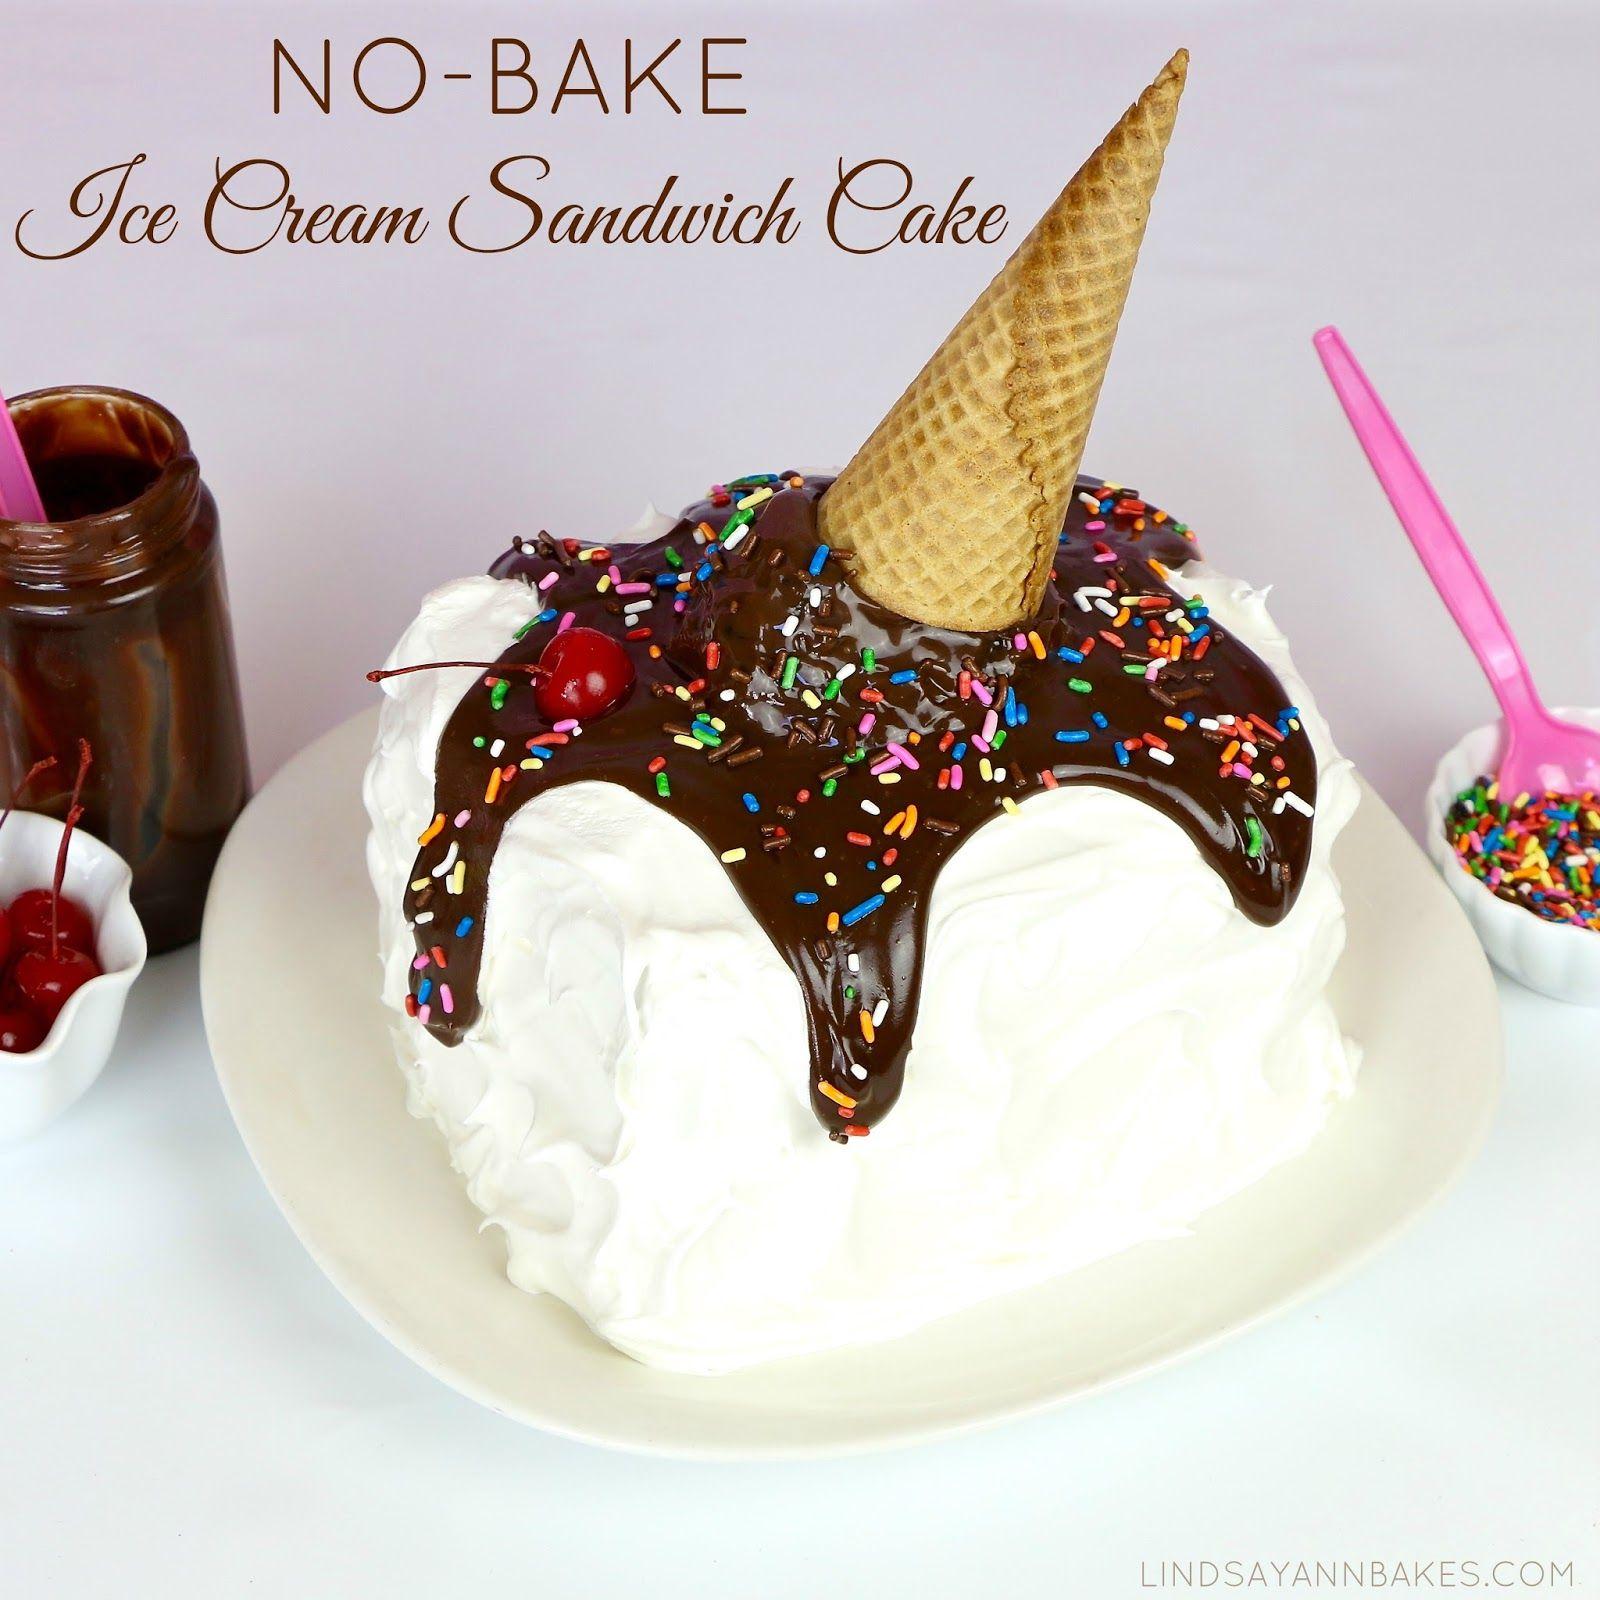 Lindsay Ann Bakes: Easy No-Bake Ice Cream Sandwich Cake